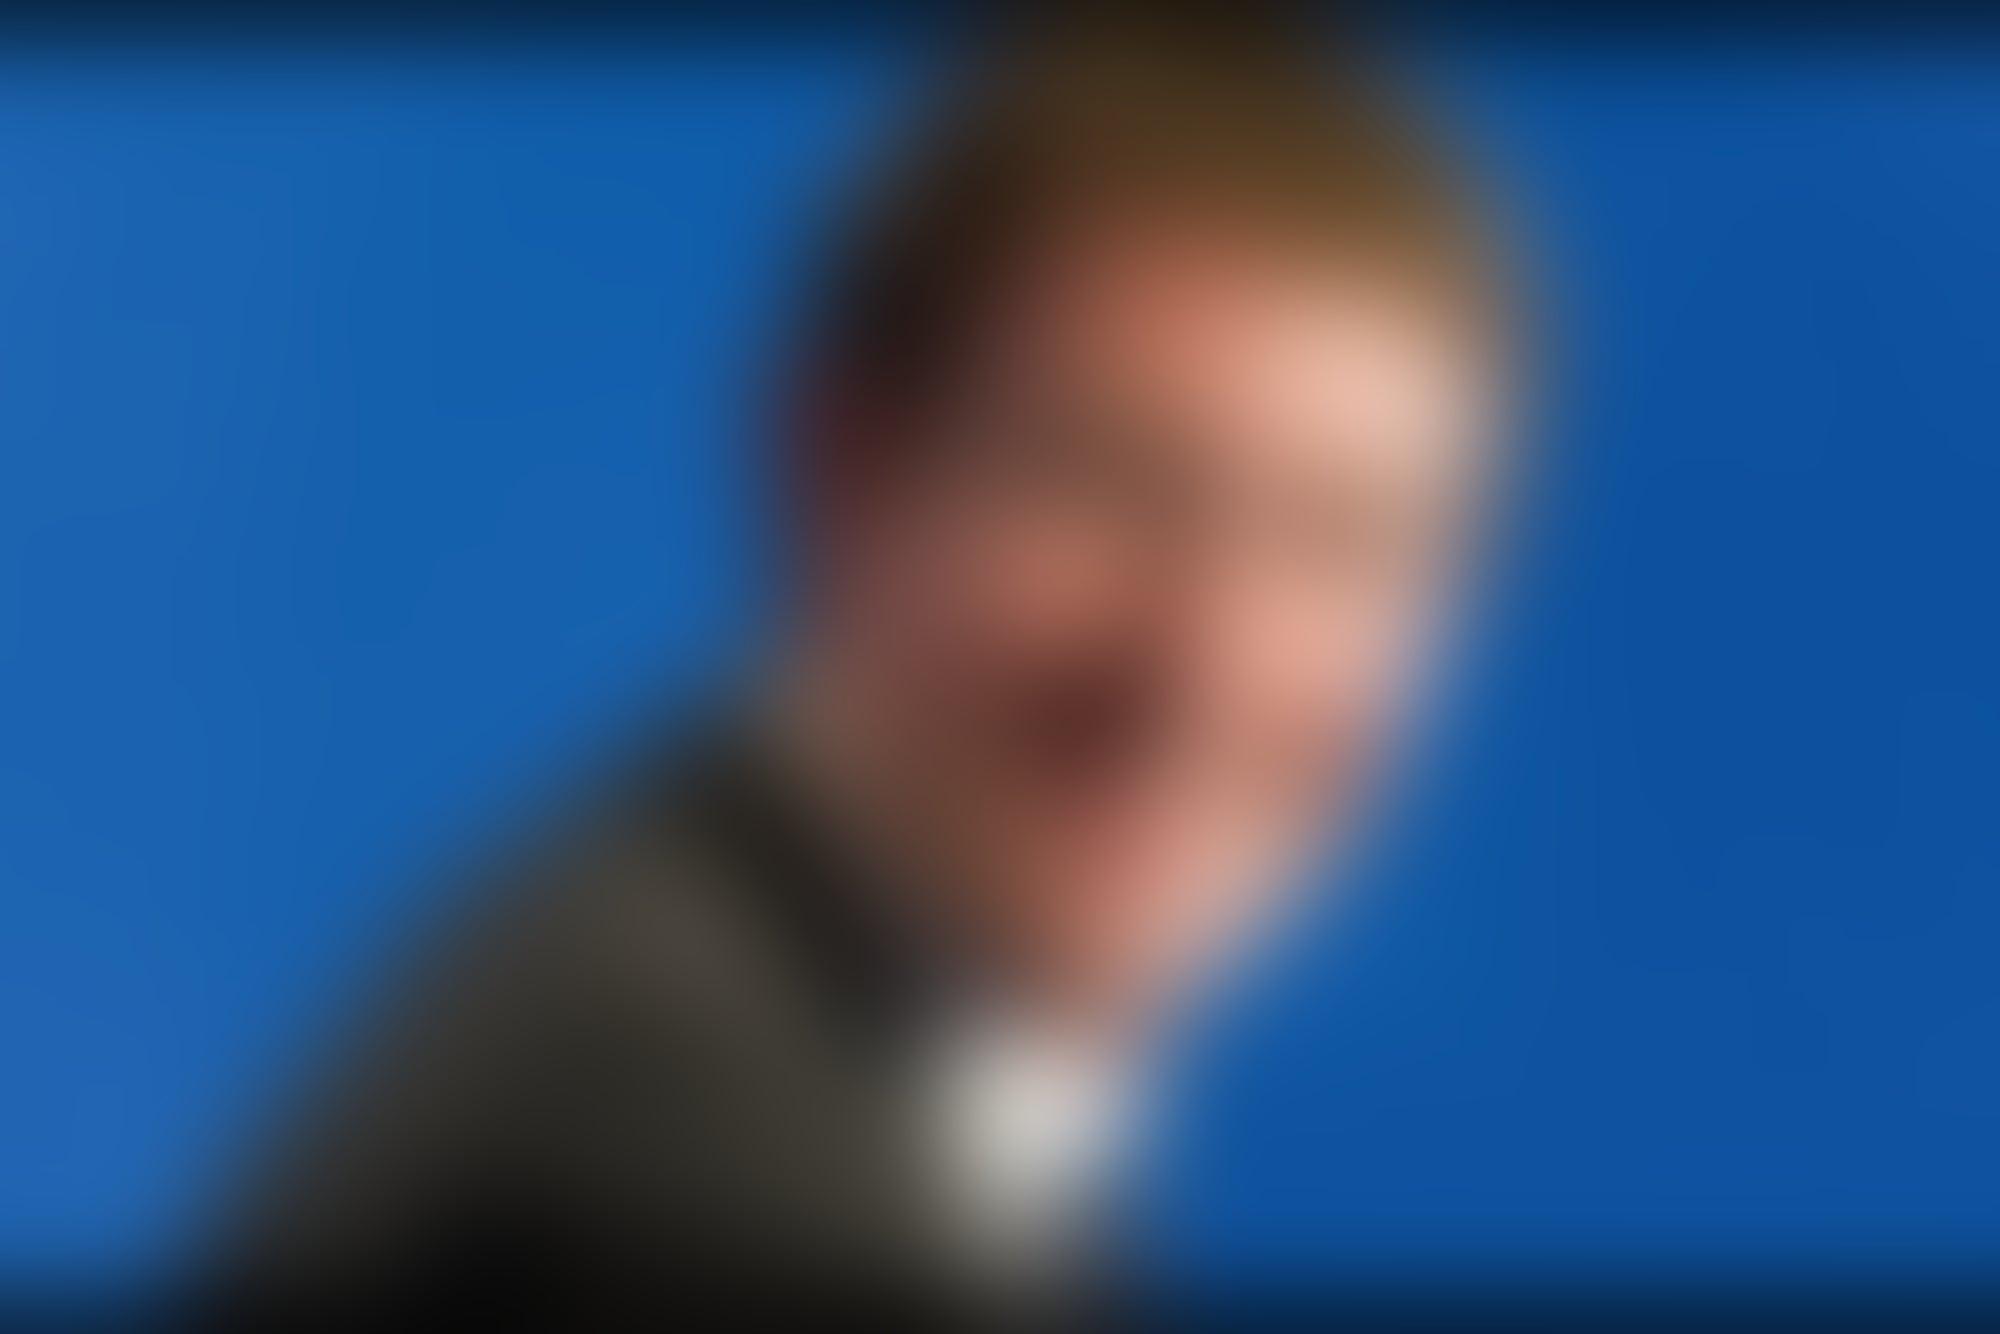 Mark Zuckerberg's Surprising Work Habits: Your Weekly News Roundup